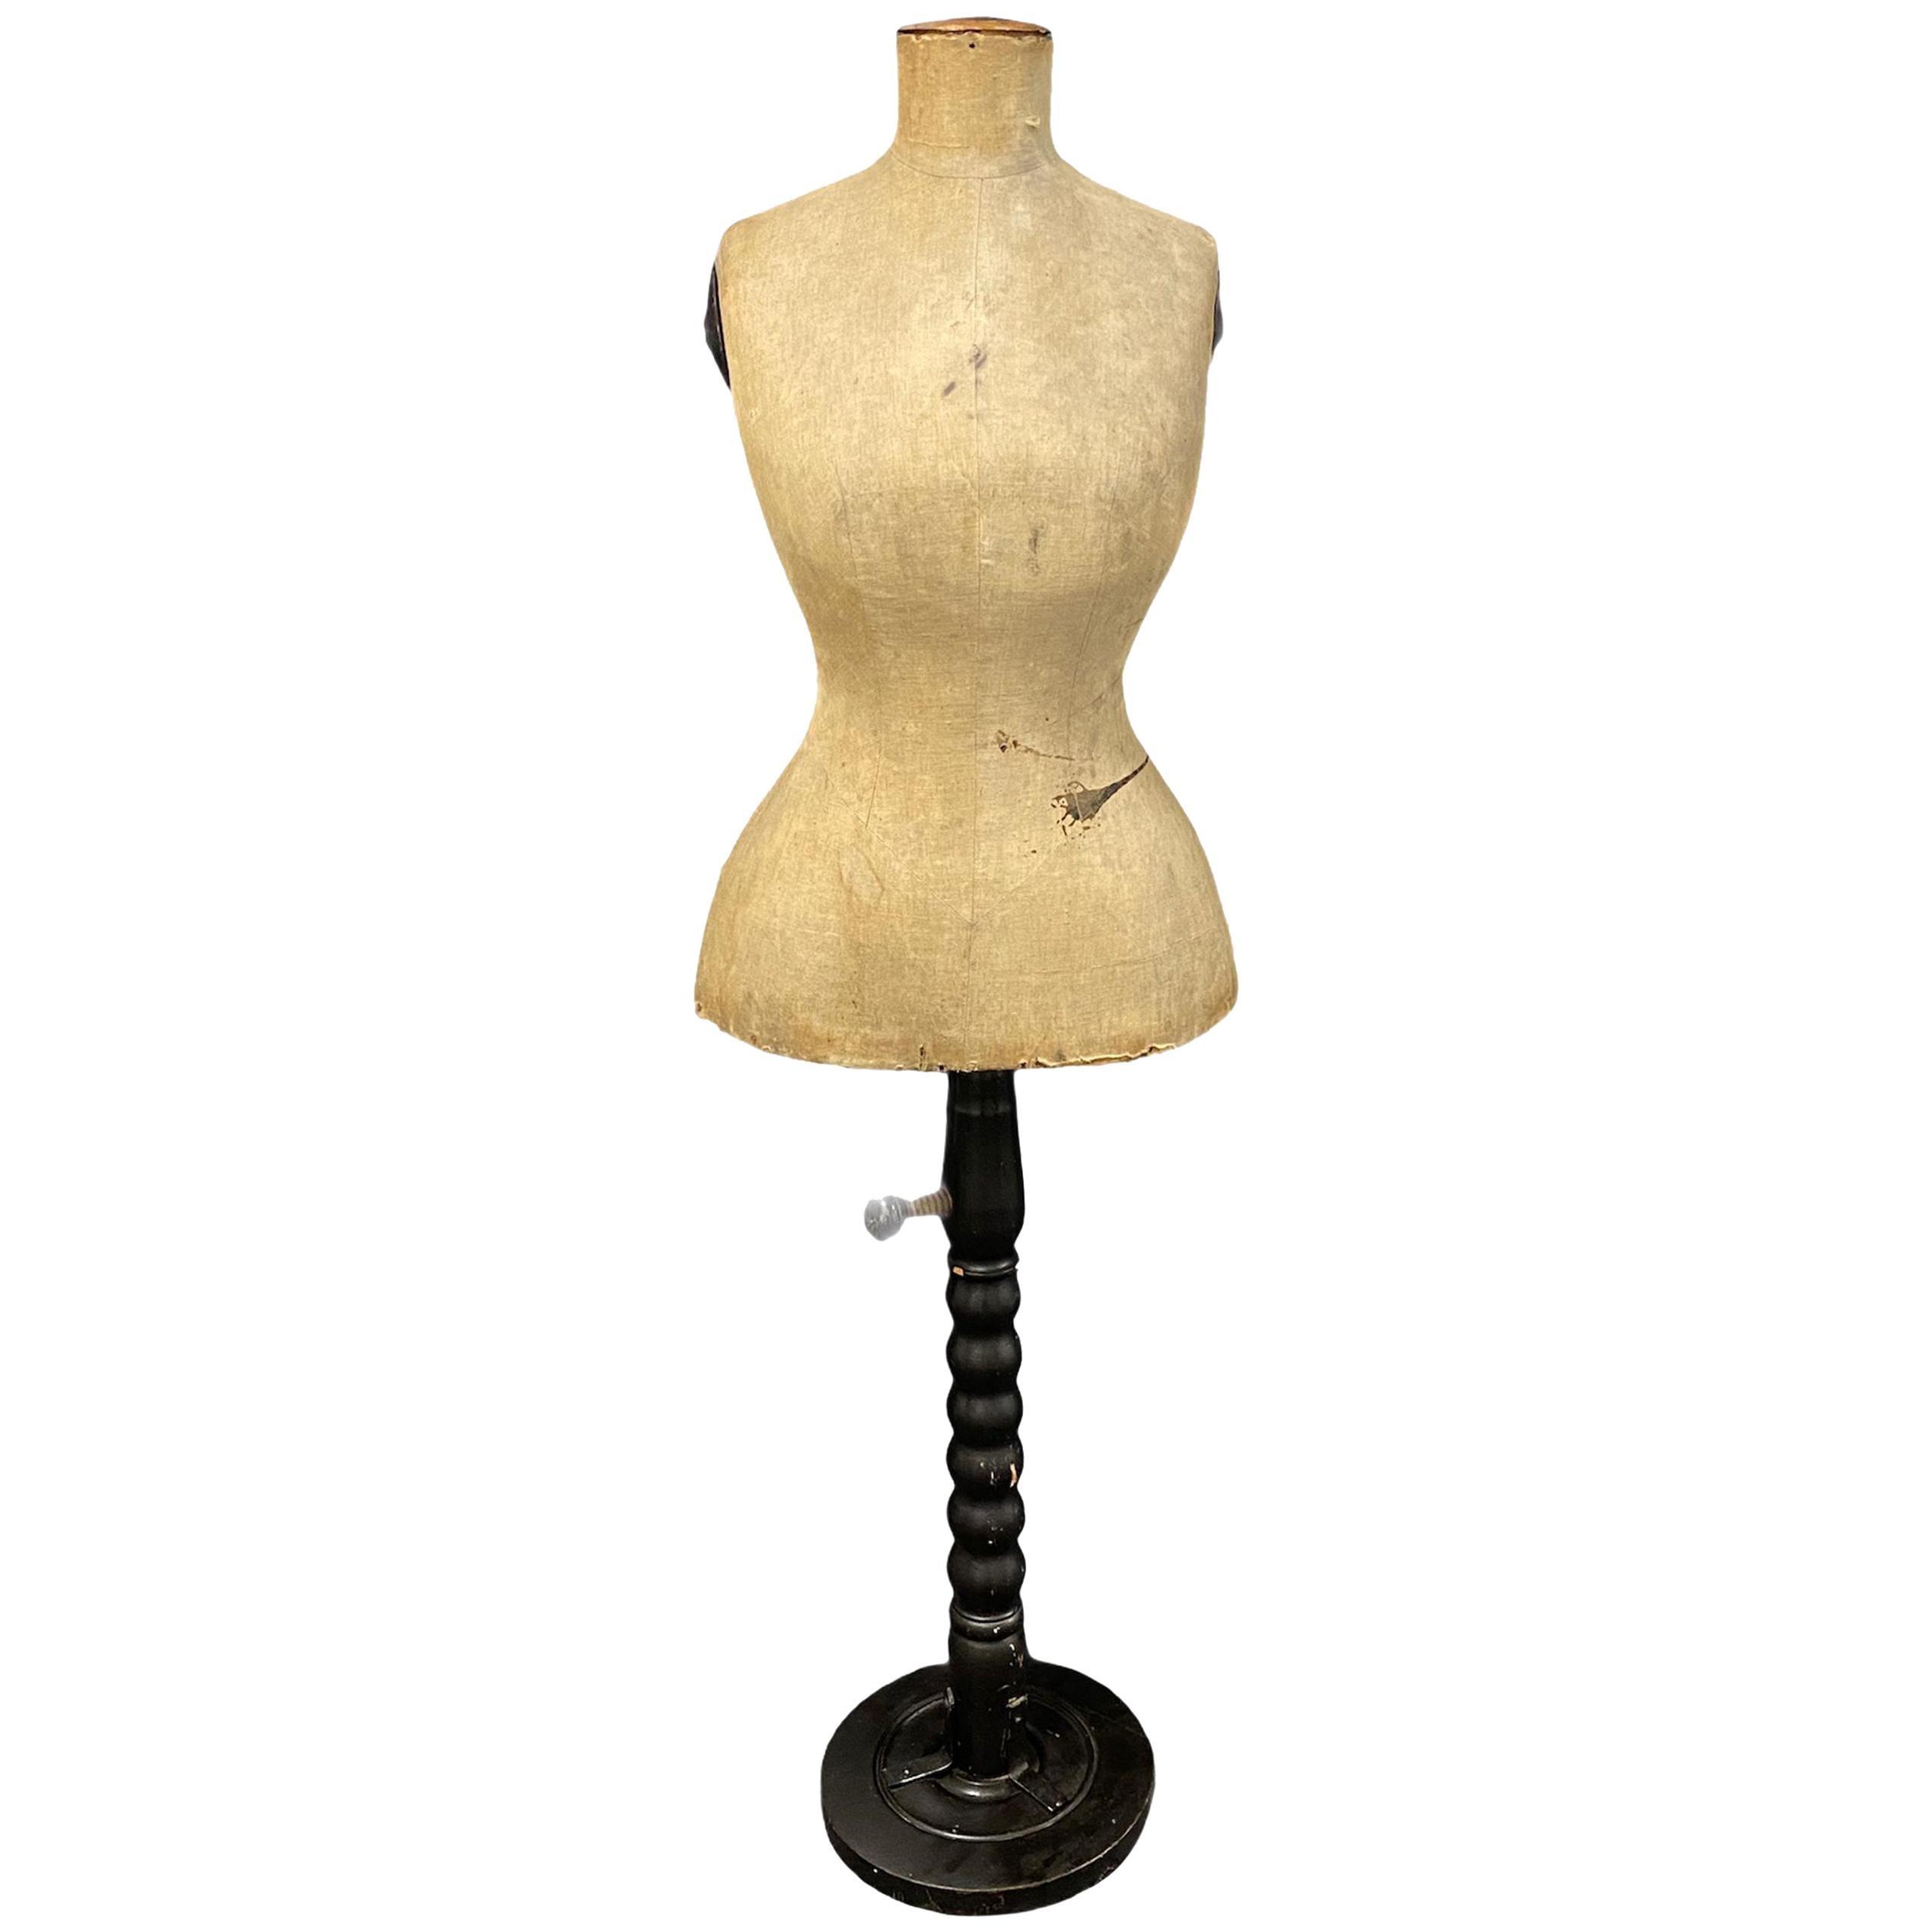 Antique Adjustable Dressmaker Mannequin, Austria, 1890s